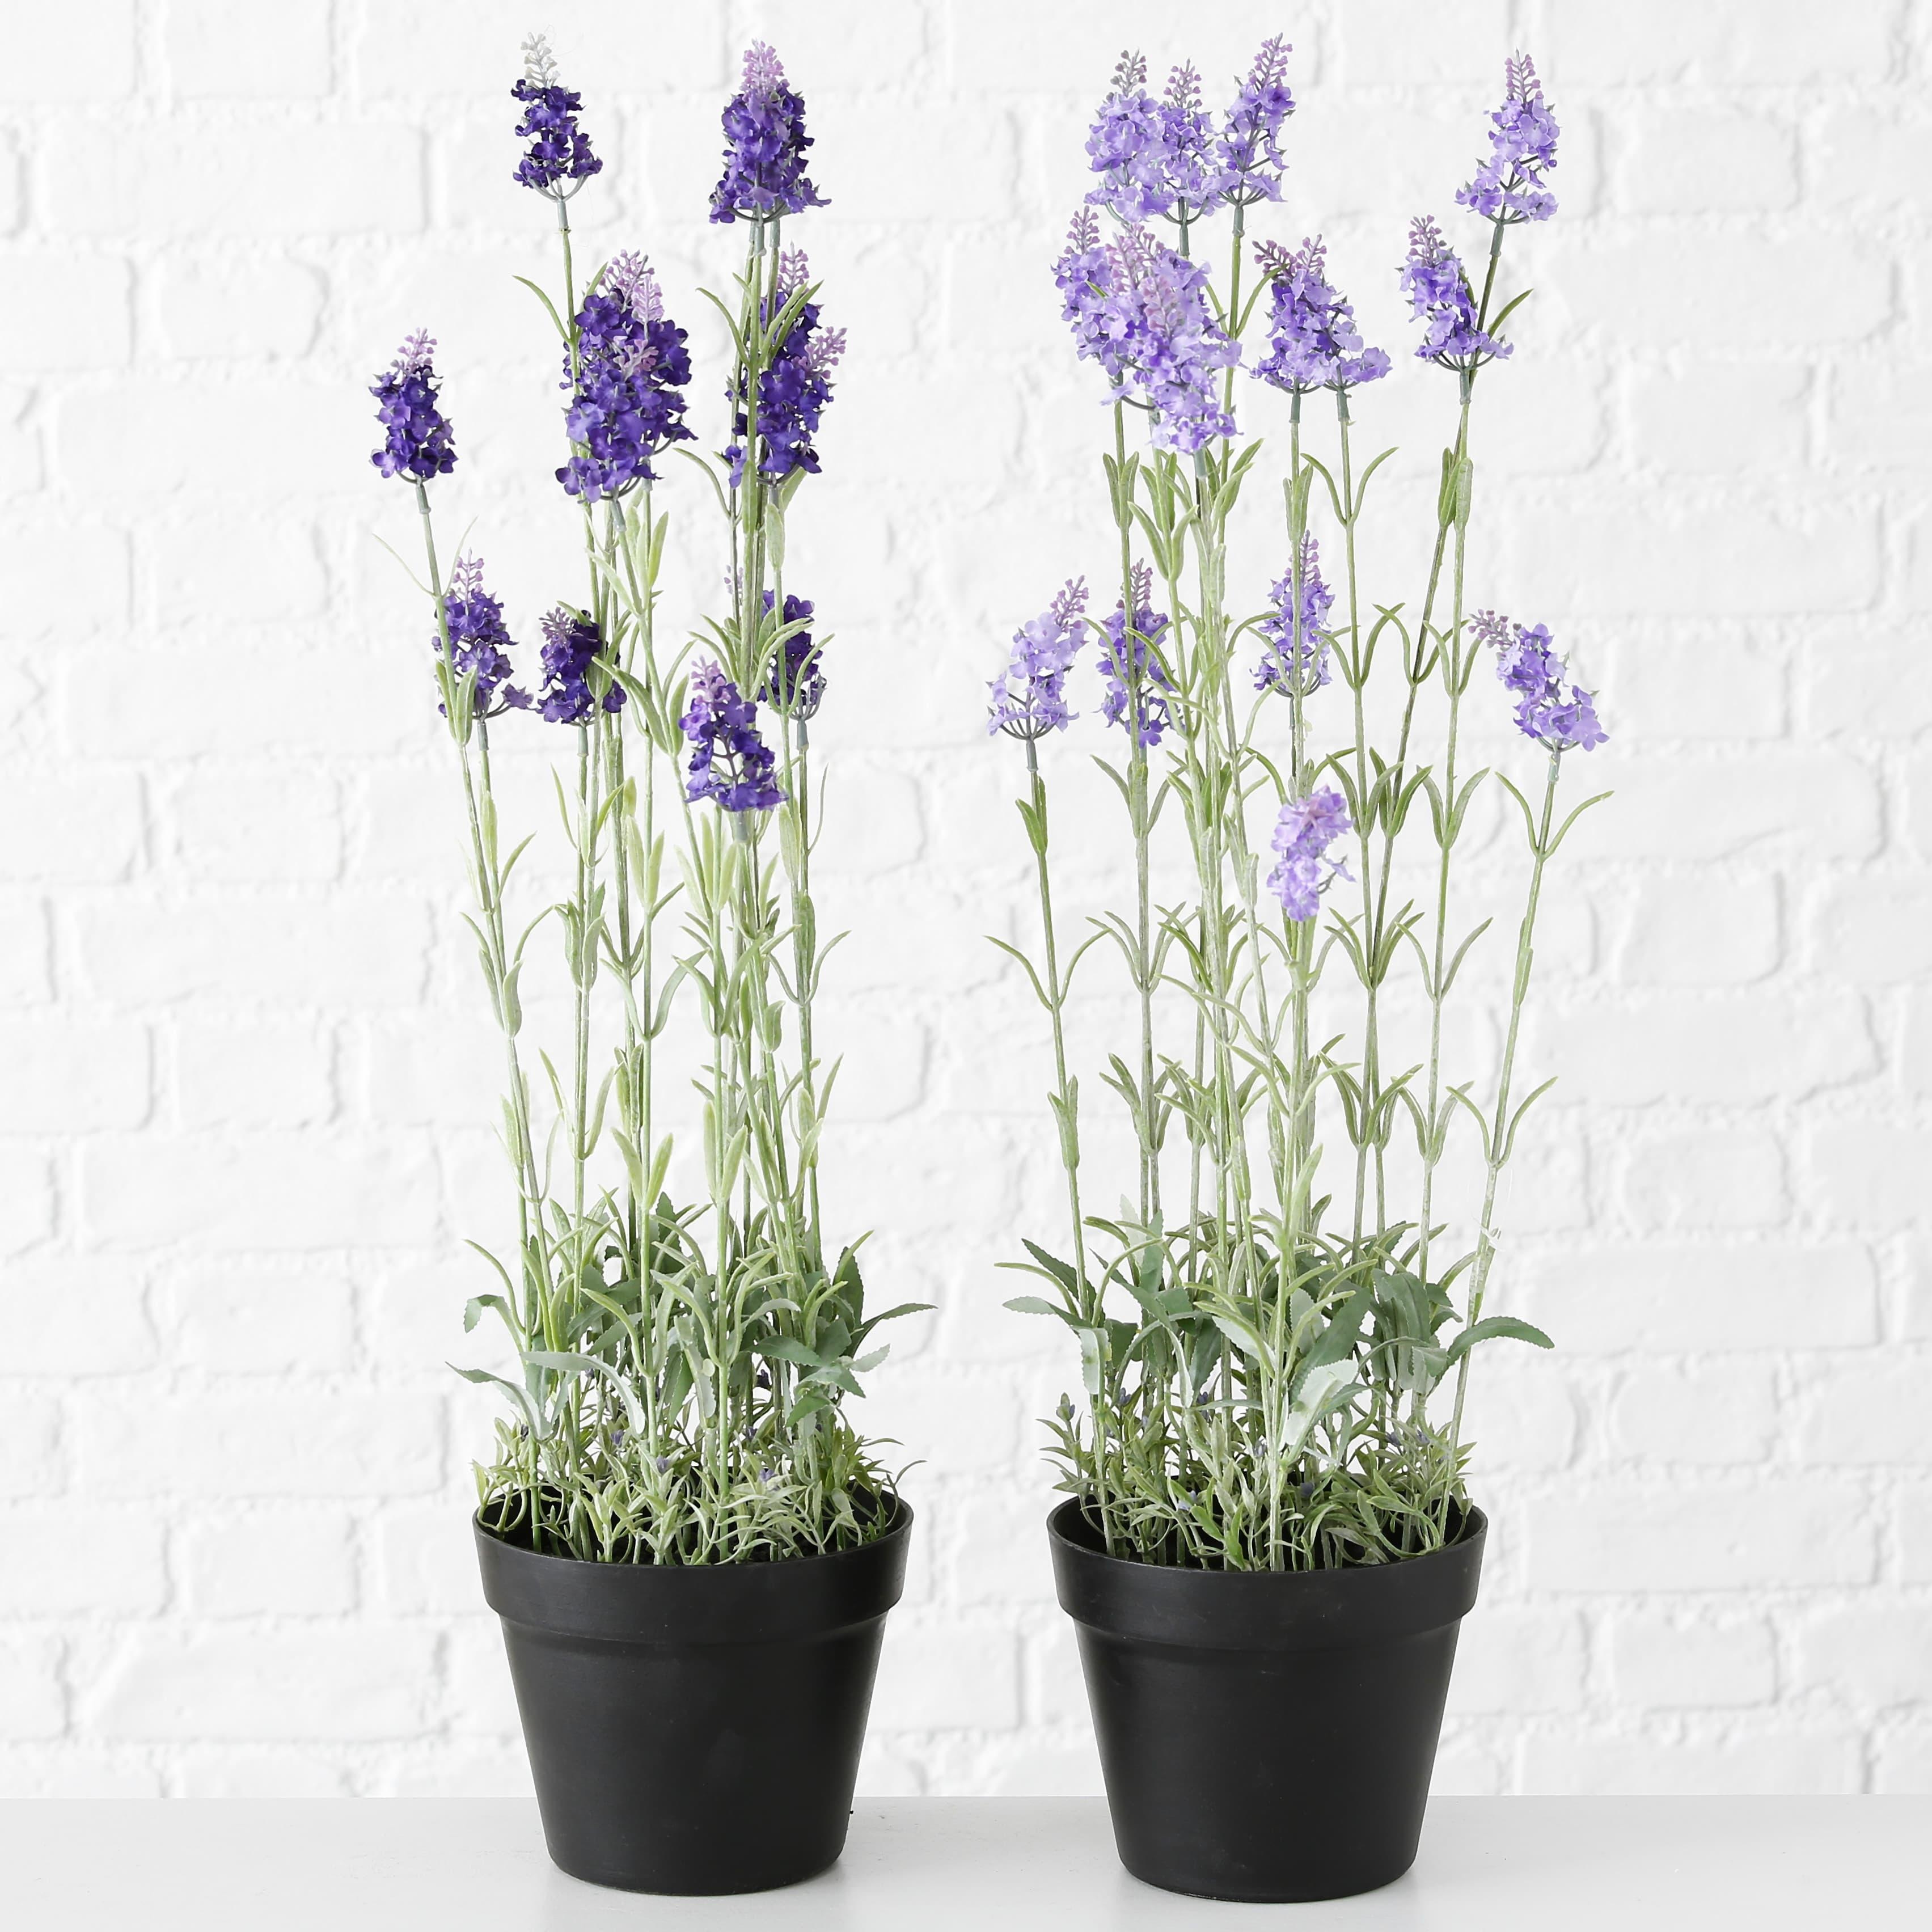 Planta artificiala in ghiveci Lavender Violet / Verde, Modele Asortate, H65 cm imagine